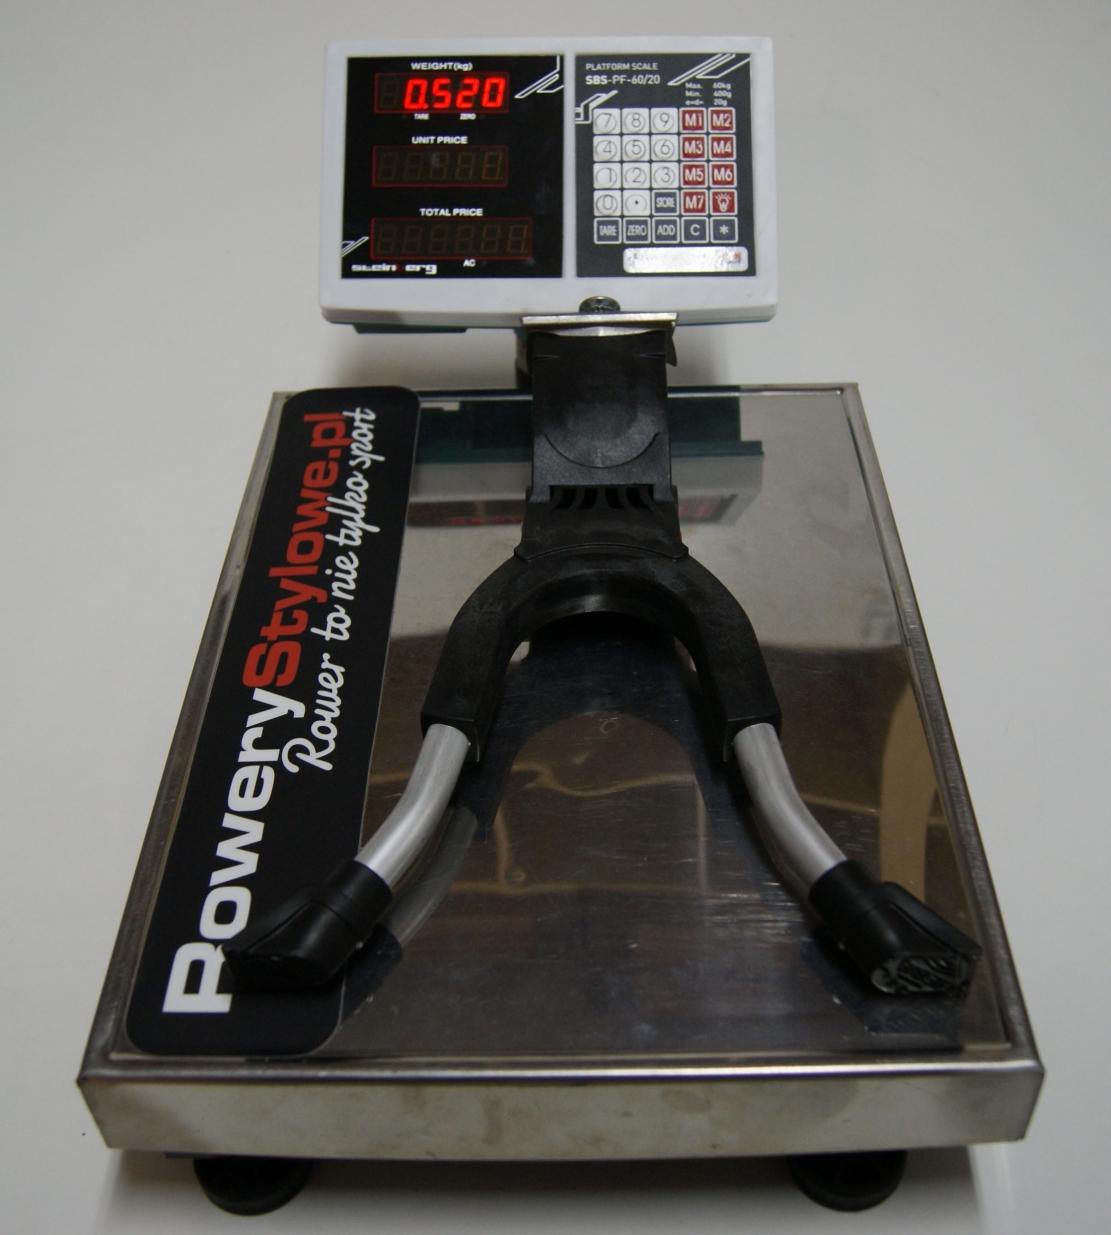 Podwójna nóżka rowerowa Hebie Light REX t 690 520 gram